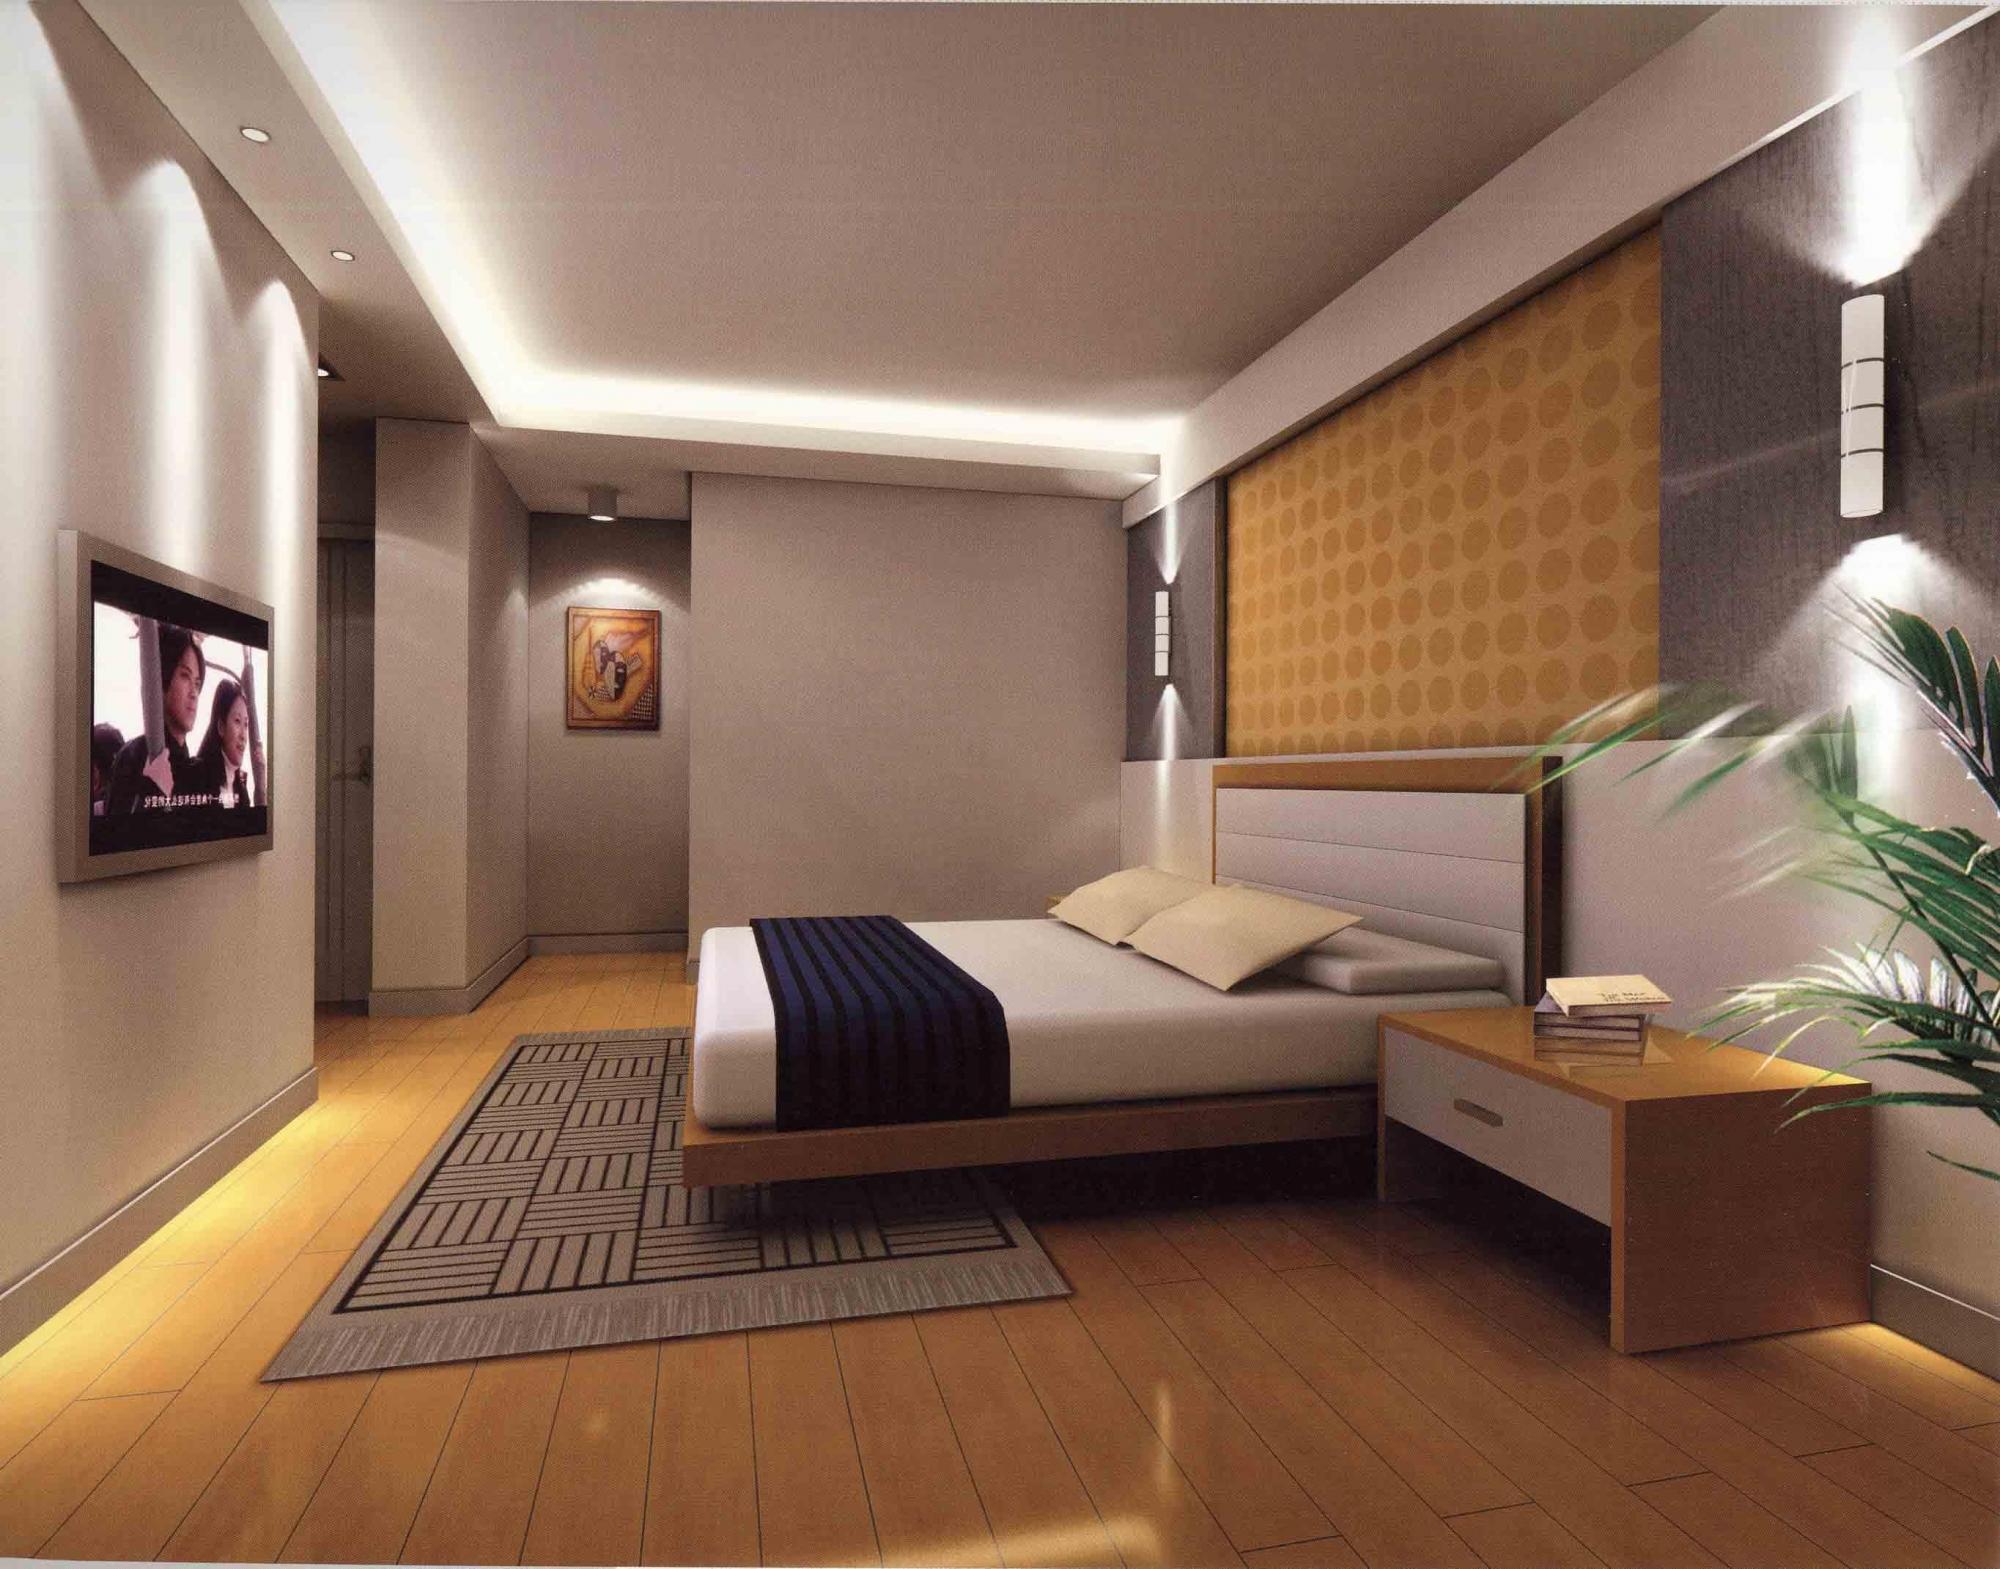 Loft Conversion Bedroom Design Garage To Bedroom Conversion Fresh Garage Conversion Bedroom